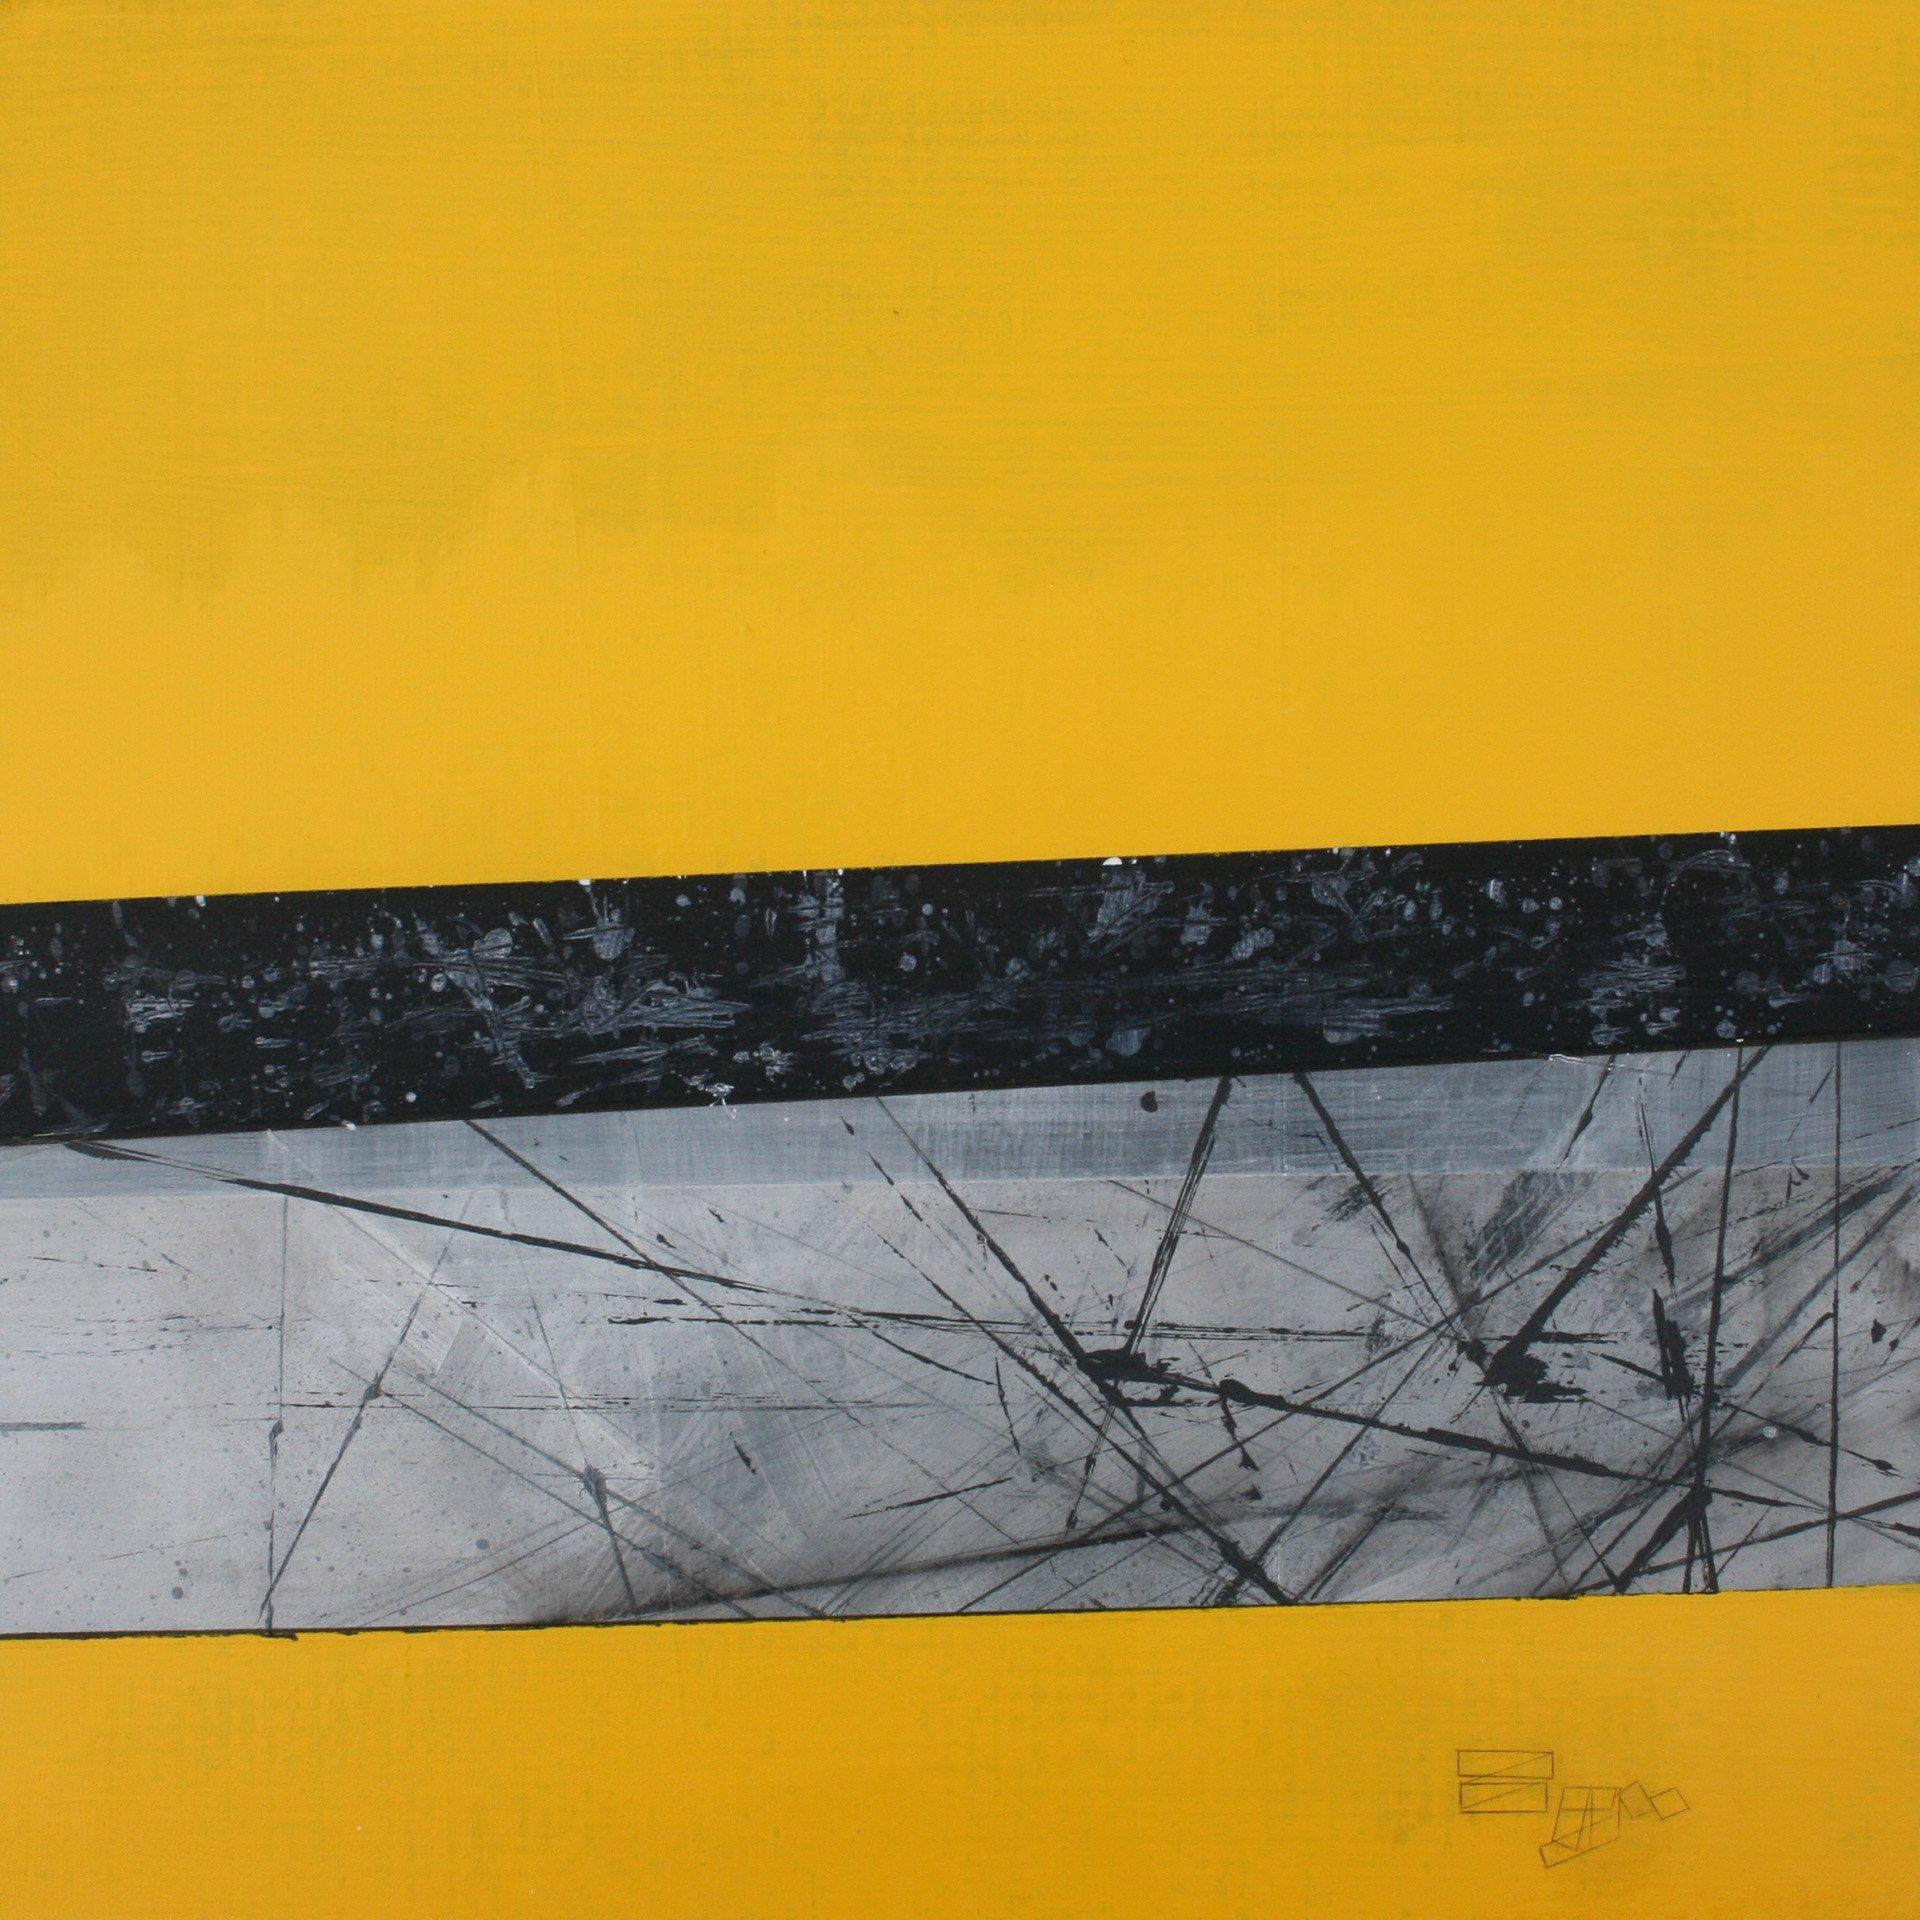 Bryan Boone work of art Lost Futures Series